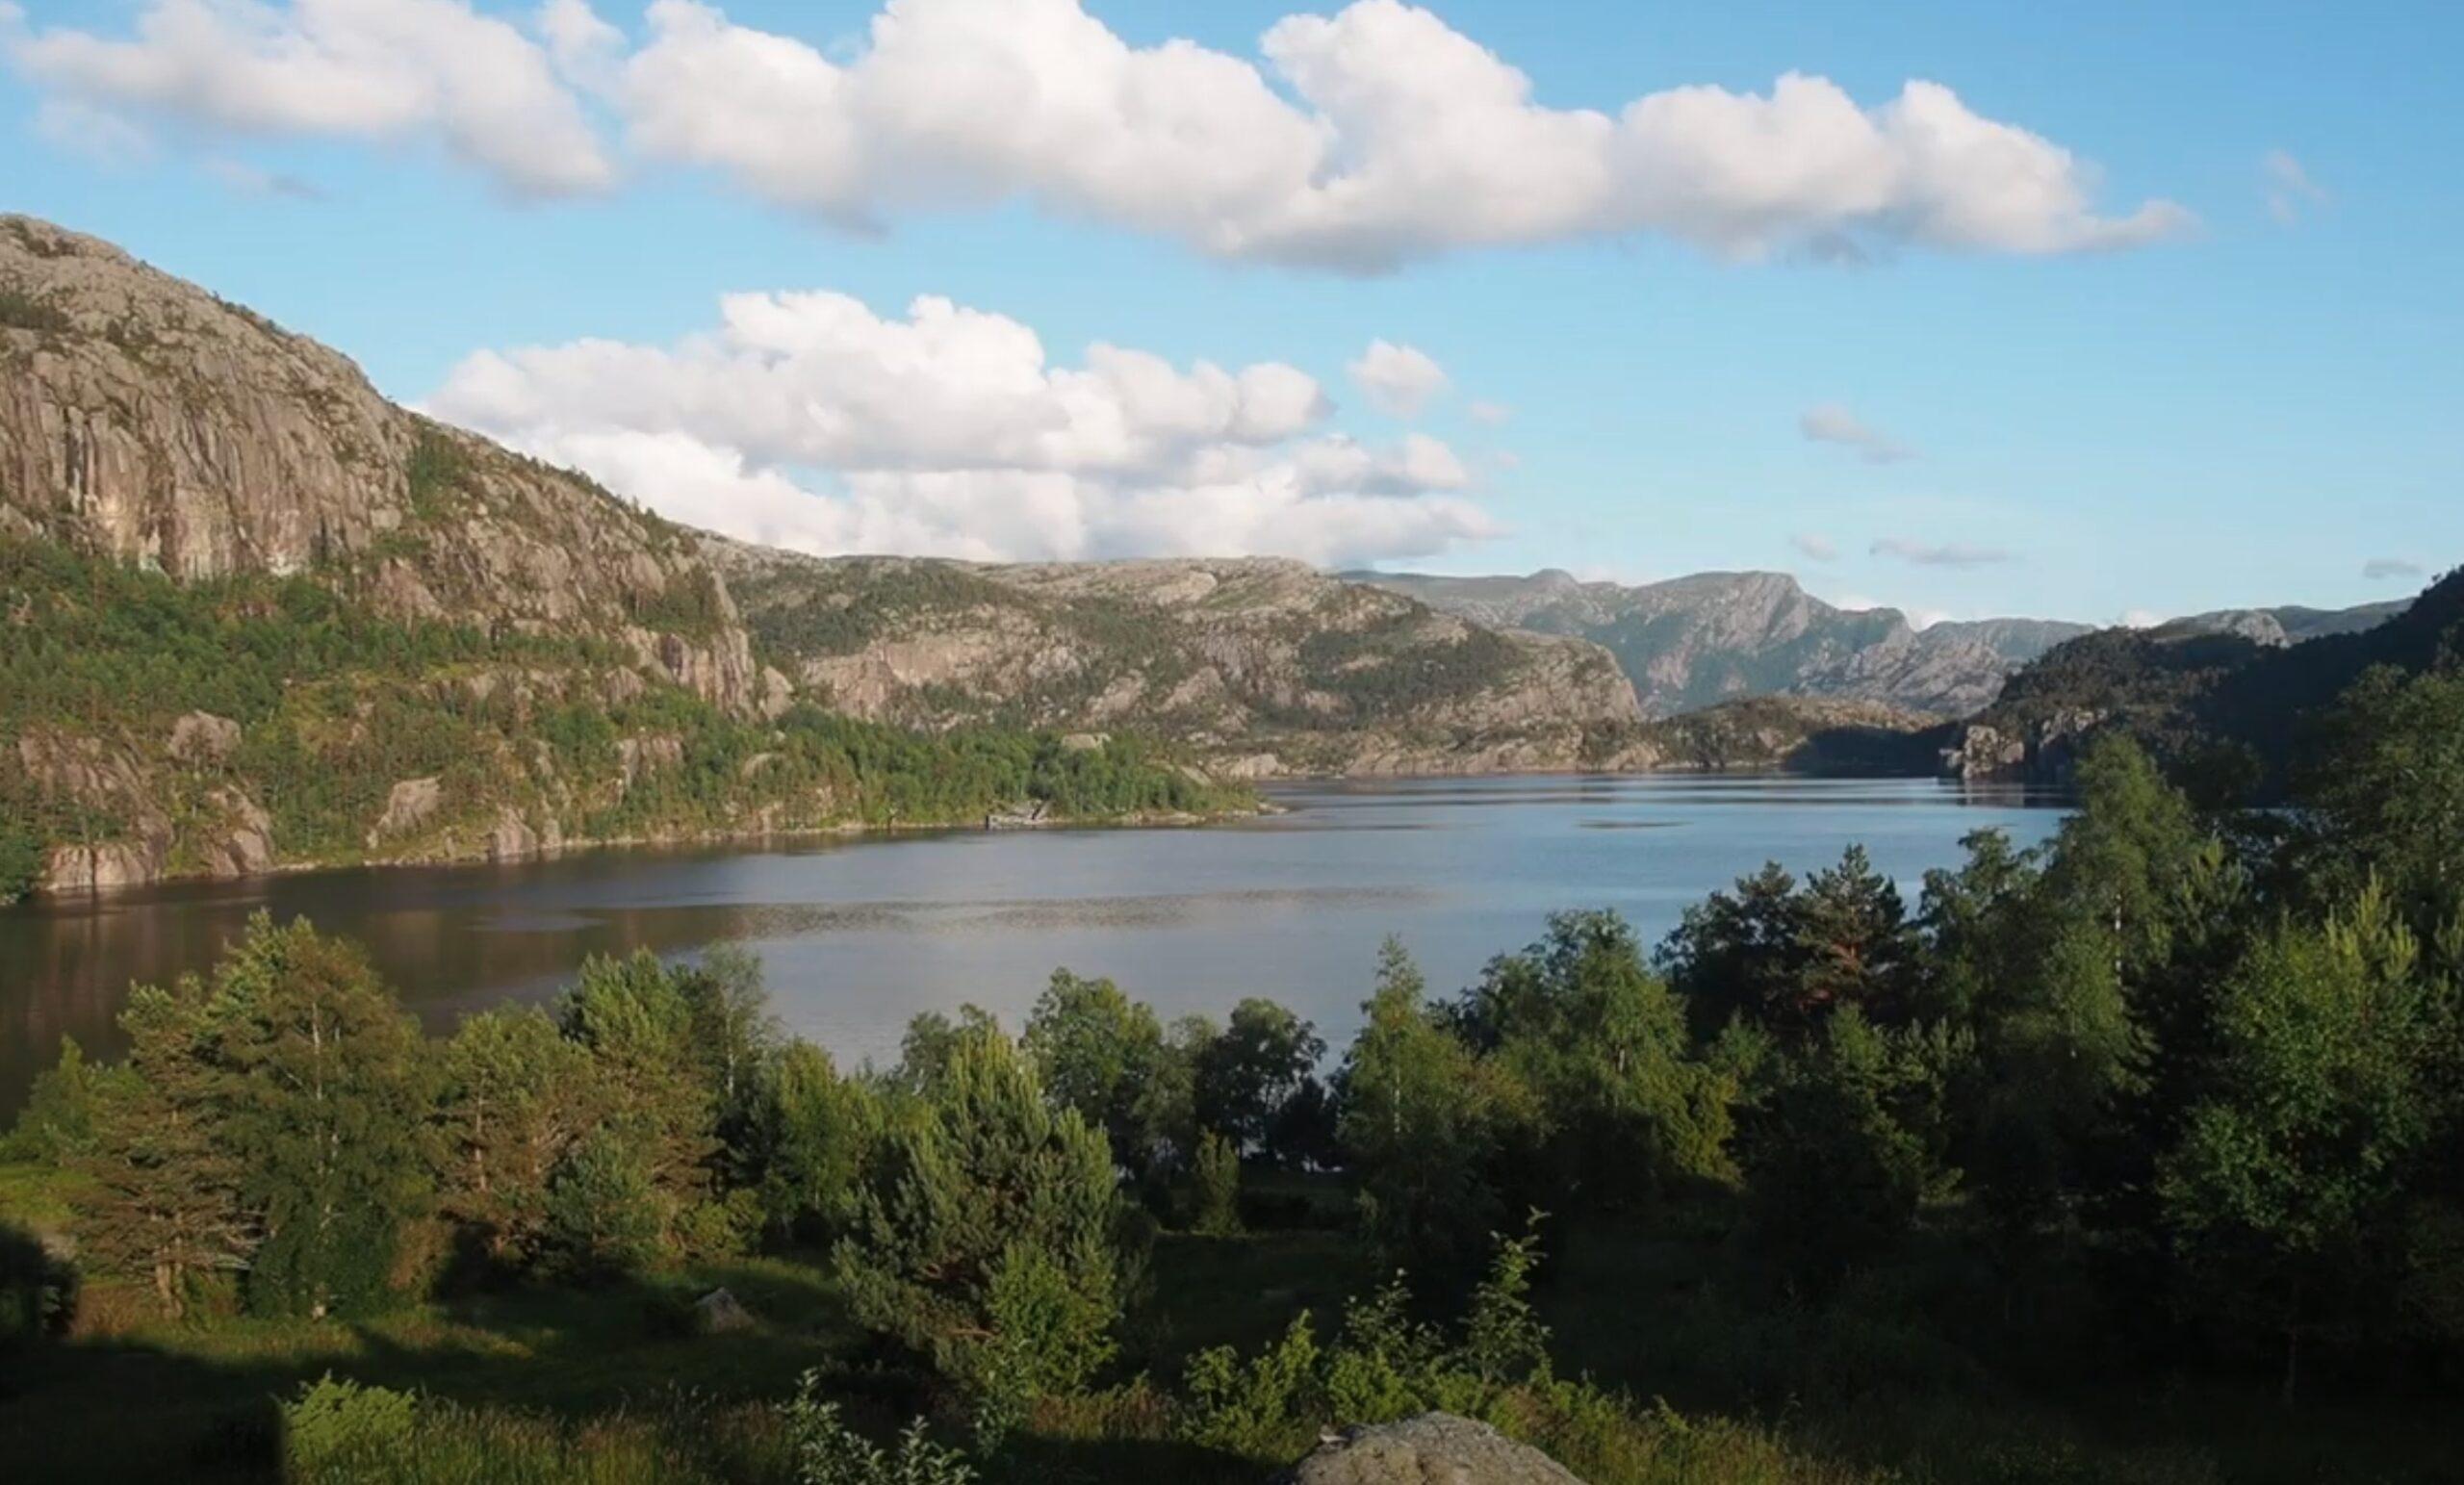 Región de Stavanger en Noruega